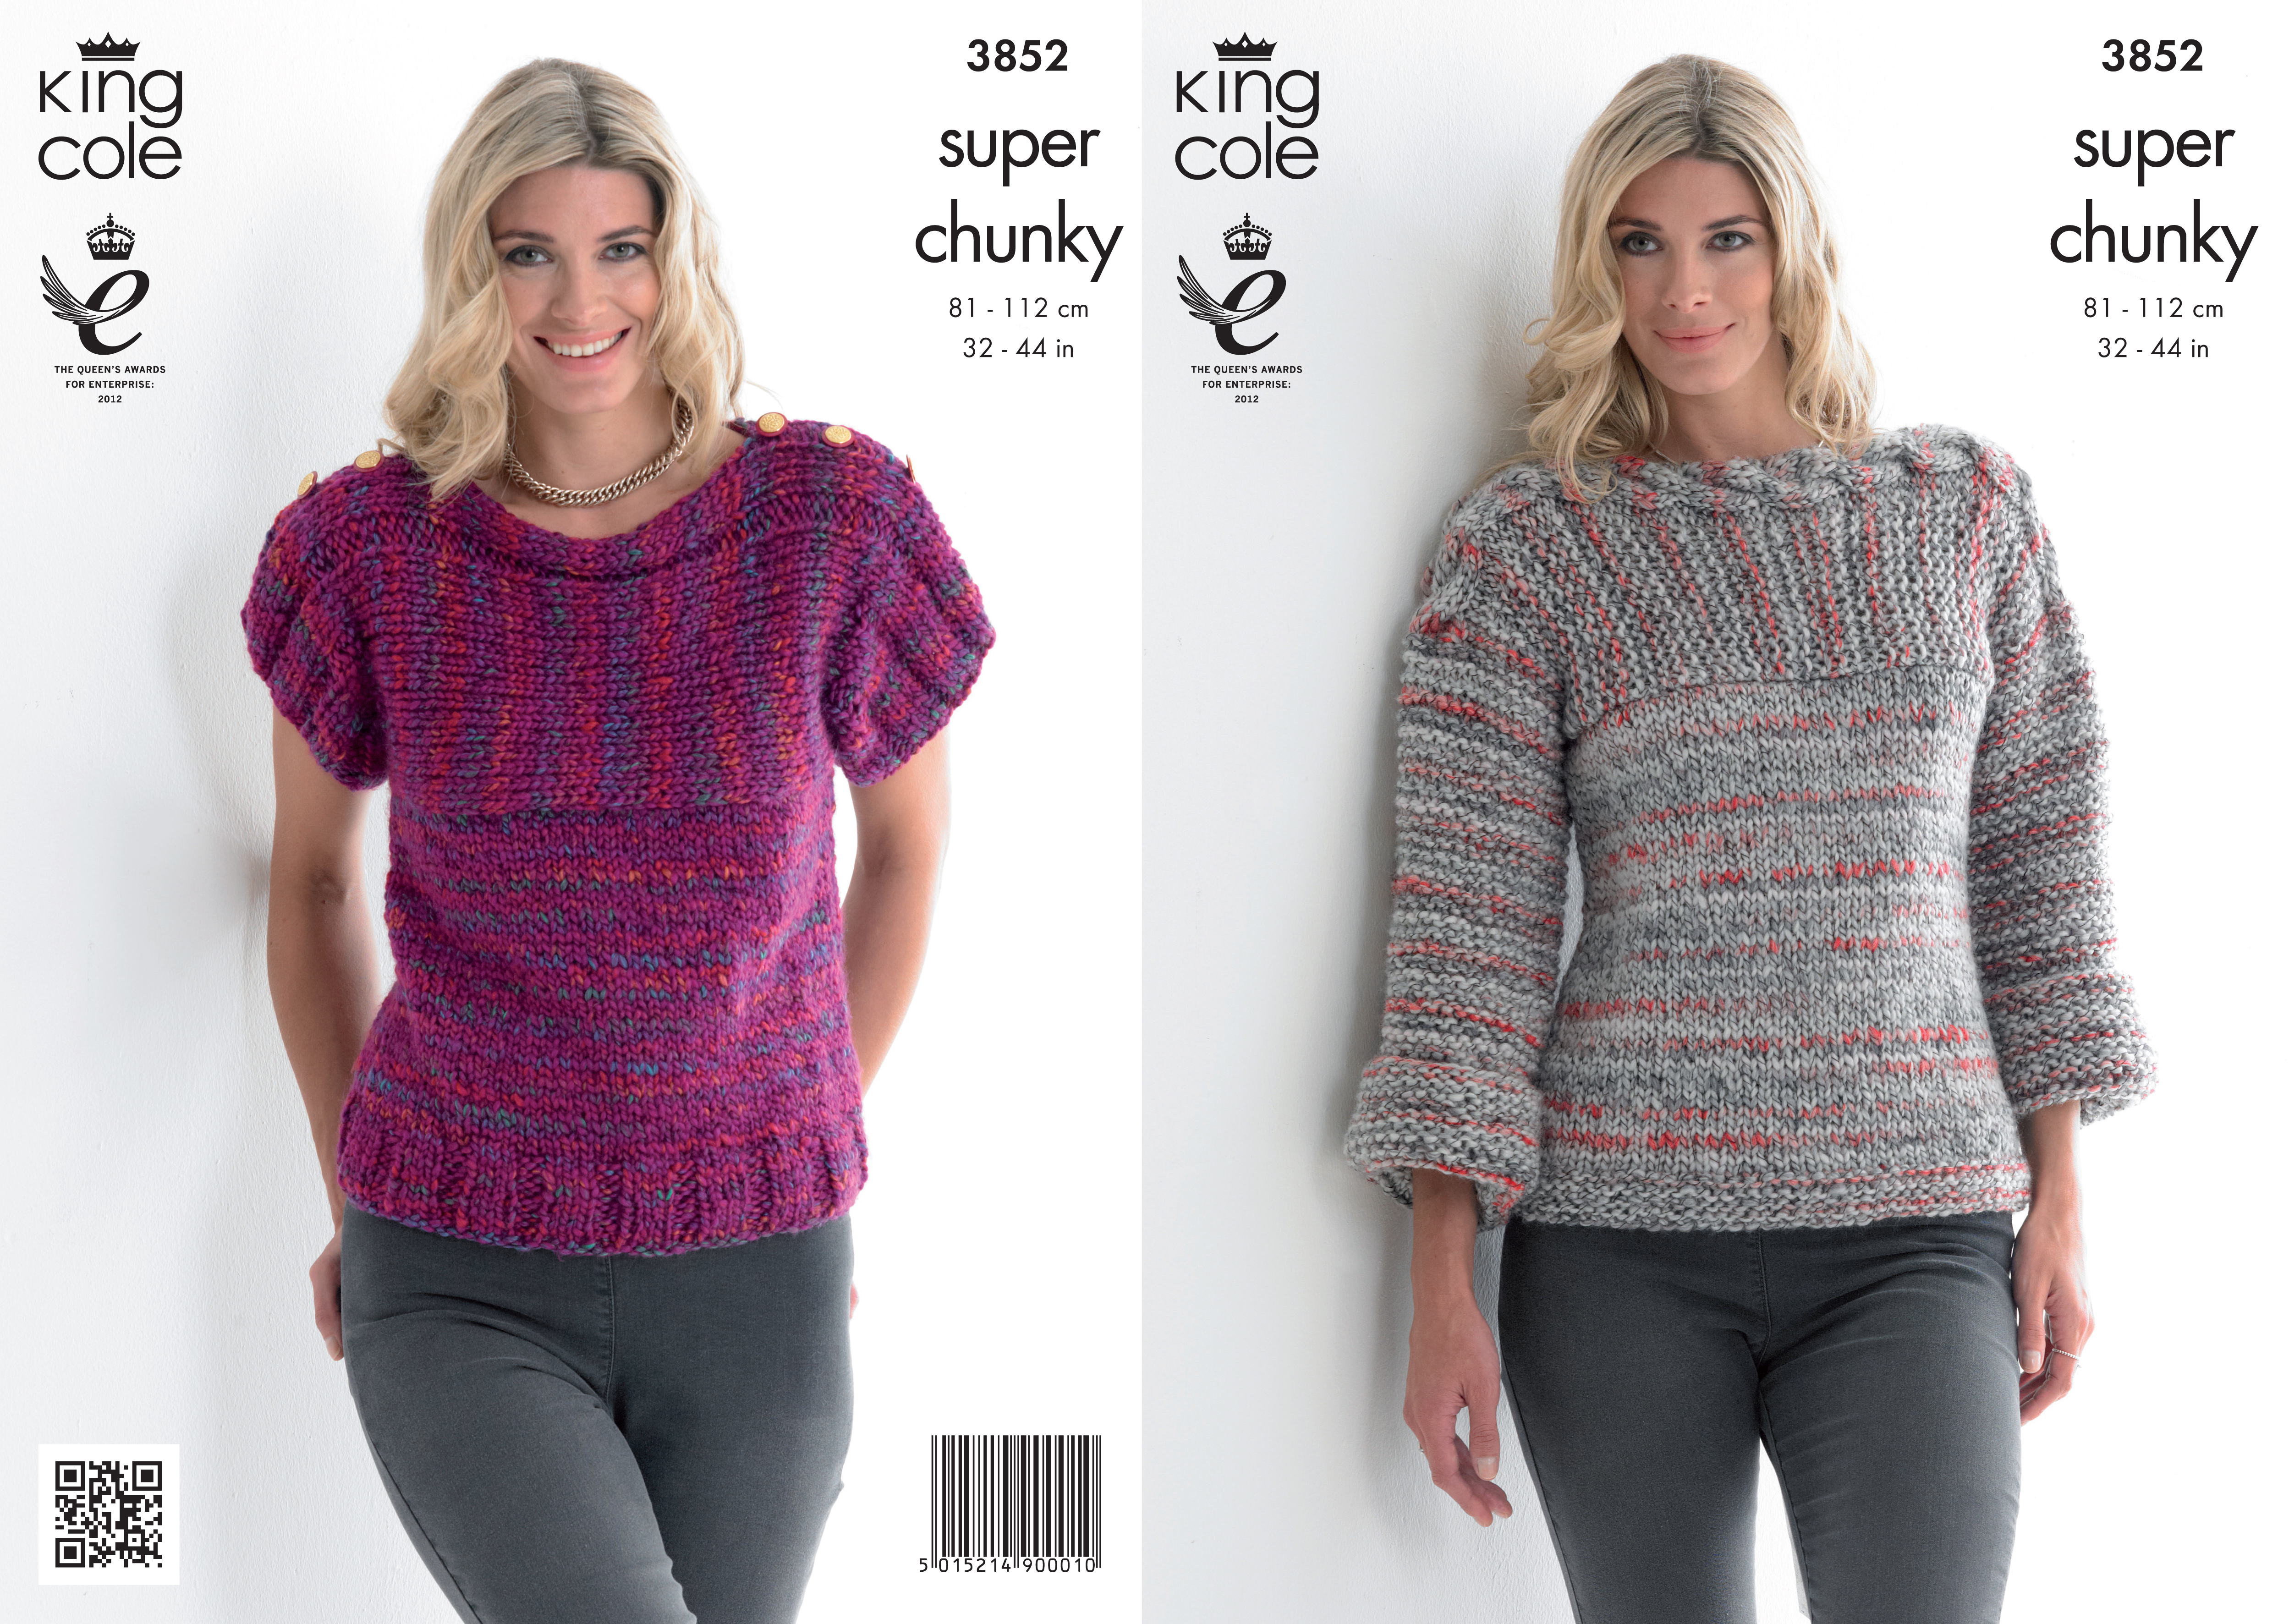 King Cole Ladies Cardigan Knitting Pattern : King Cole Ladies Gypsy Super Chunky Knitting Pattern Womens Sweater Top 3852 ...